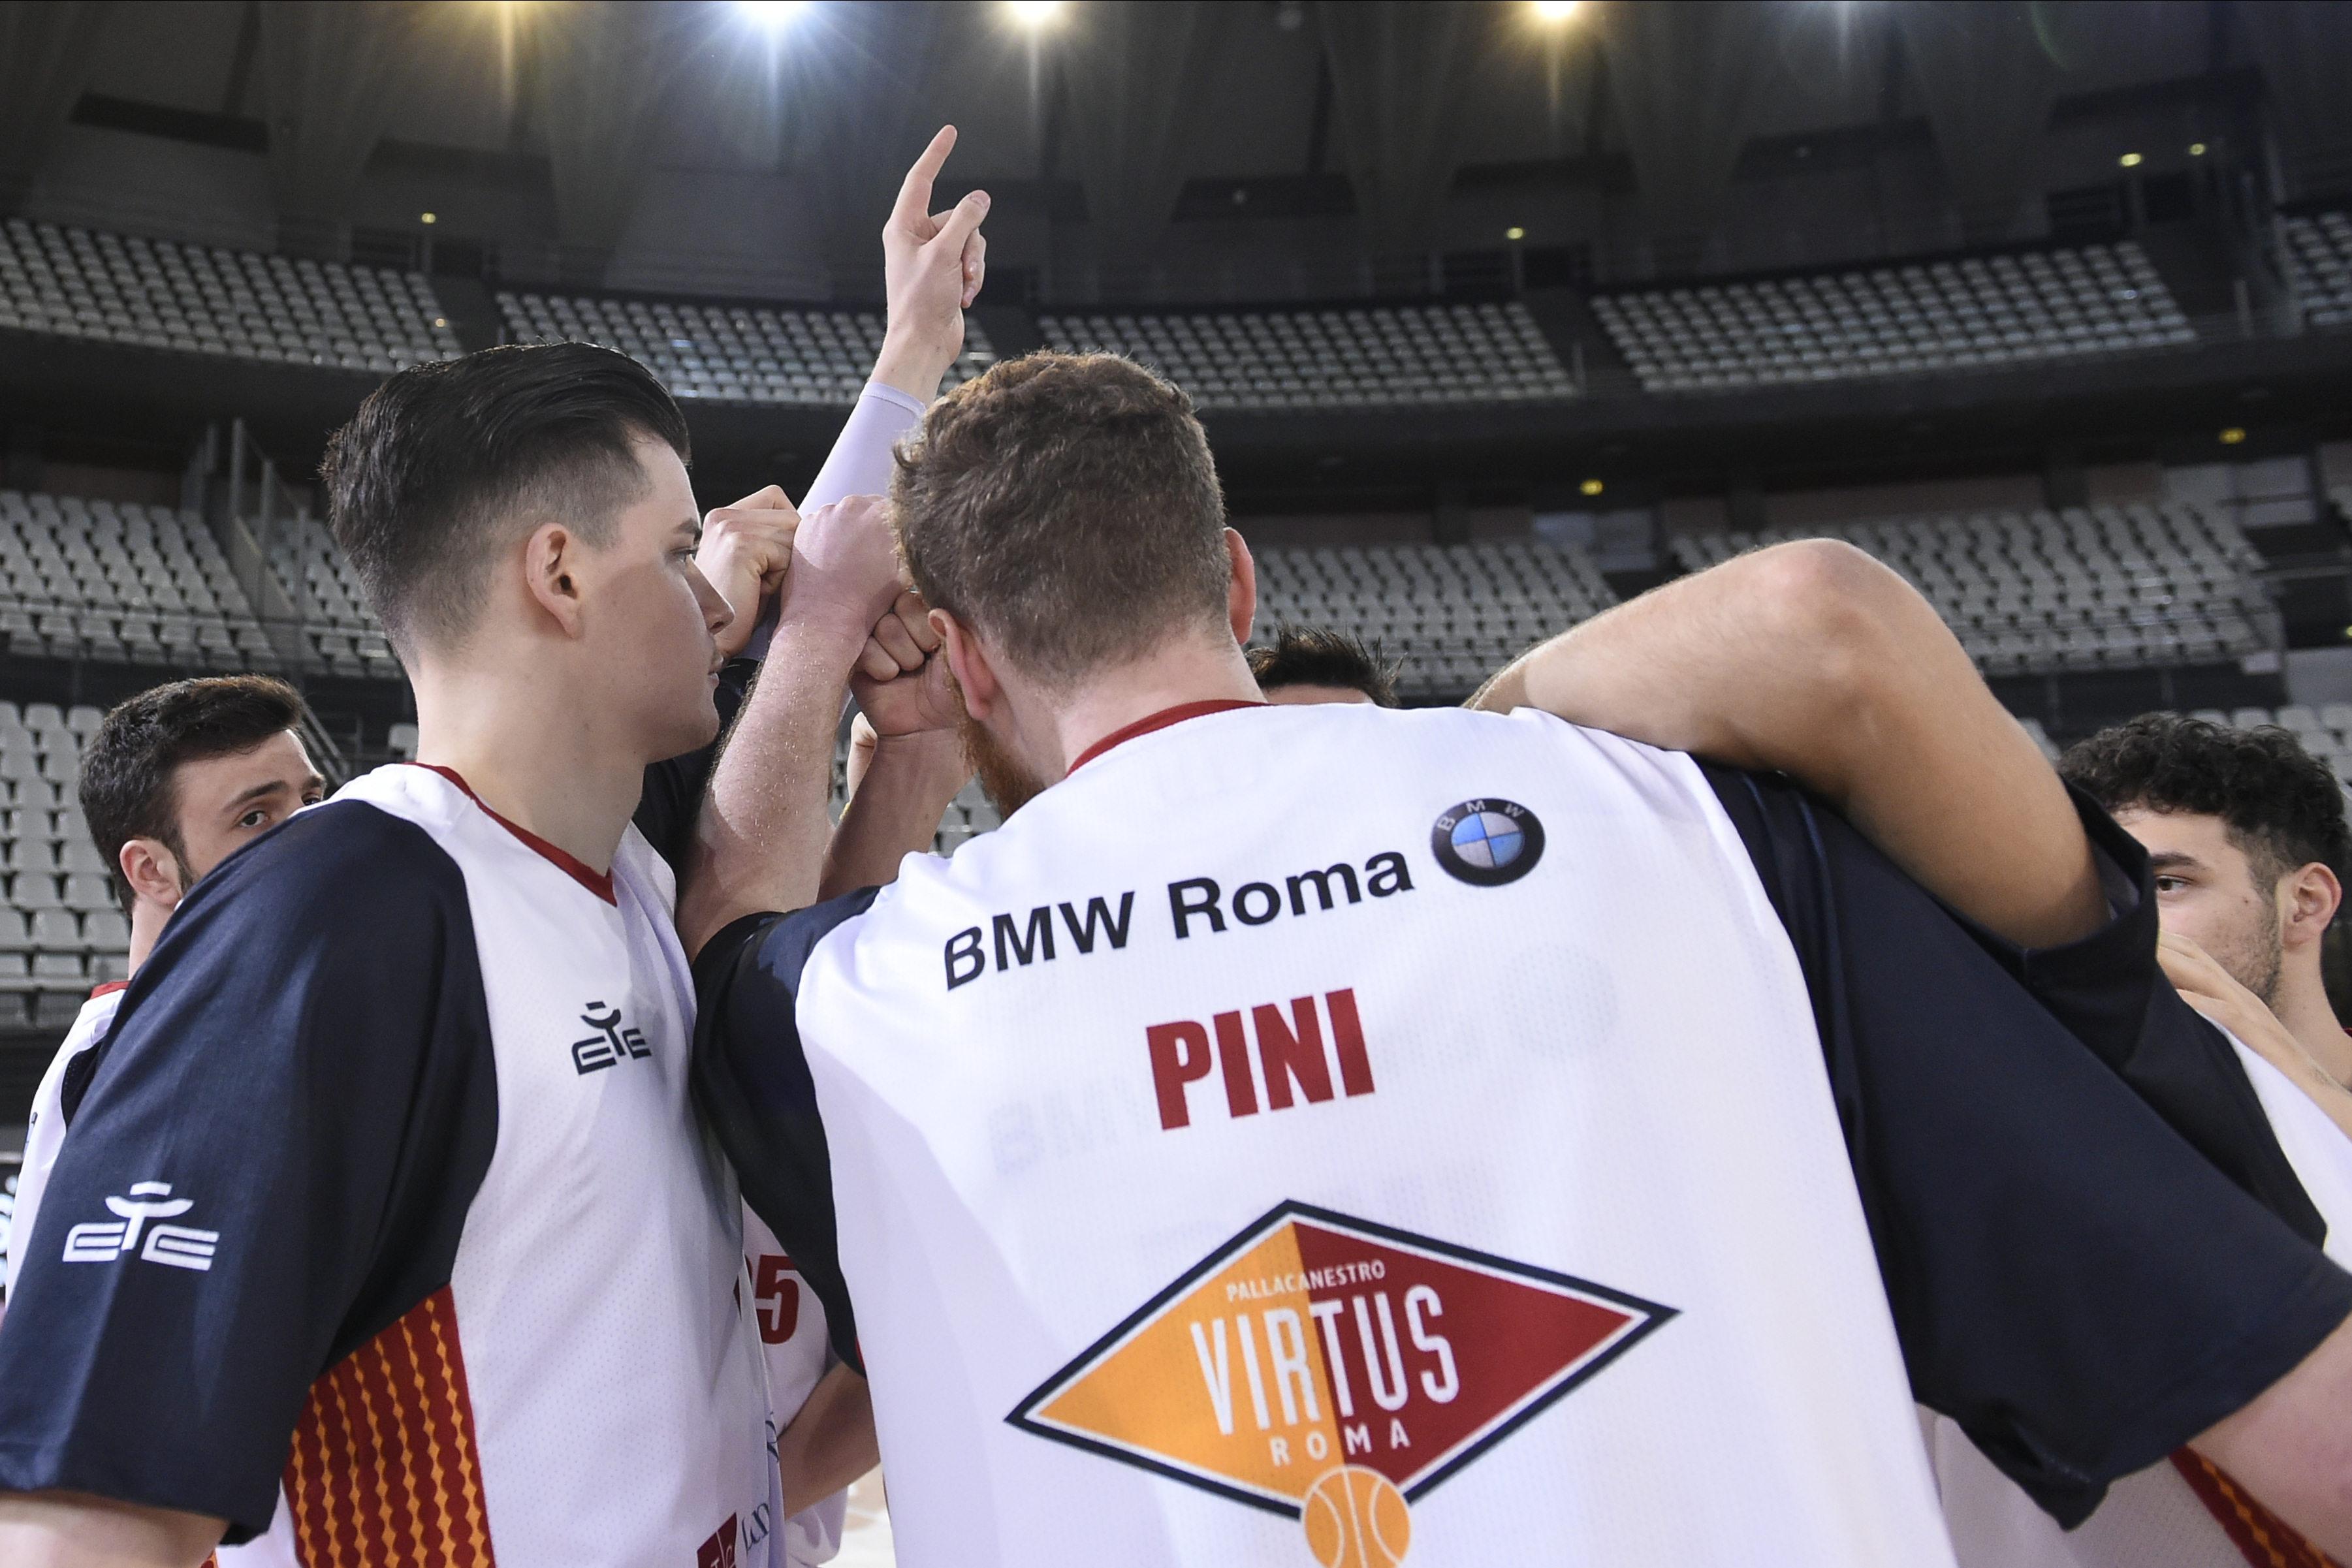 Virtus Roma - Banco di Sardegna Sassari Lega Basket Serie A 2019/2020 Roma, 07/03/2020 Foto Gennaro Masi / Ciamillo-Castoria